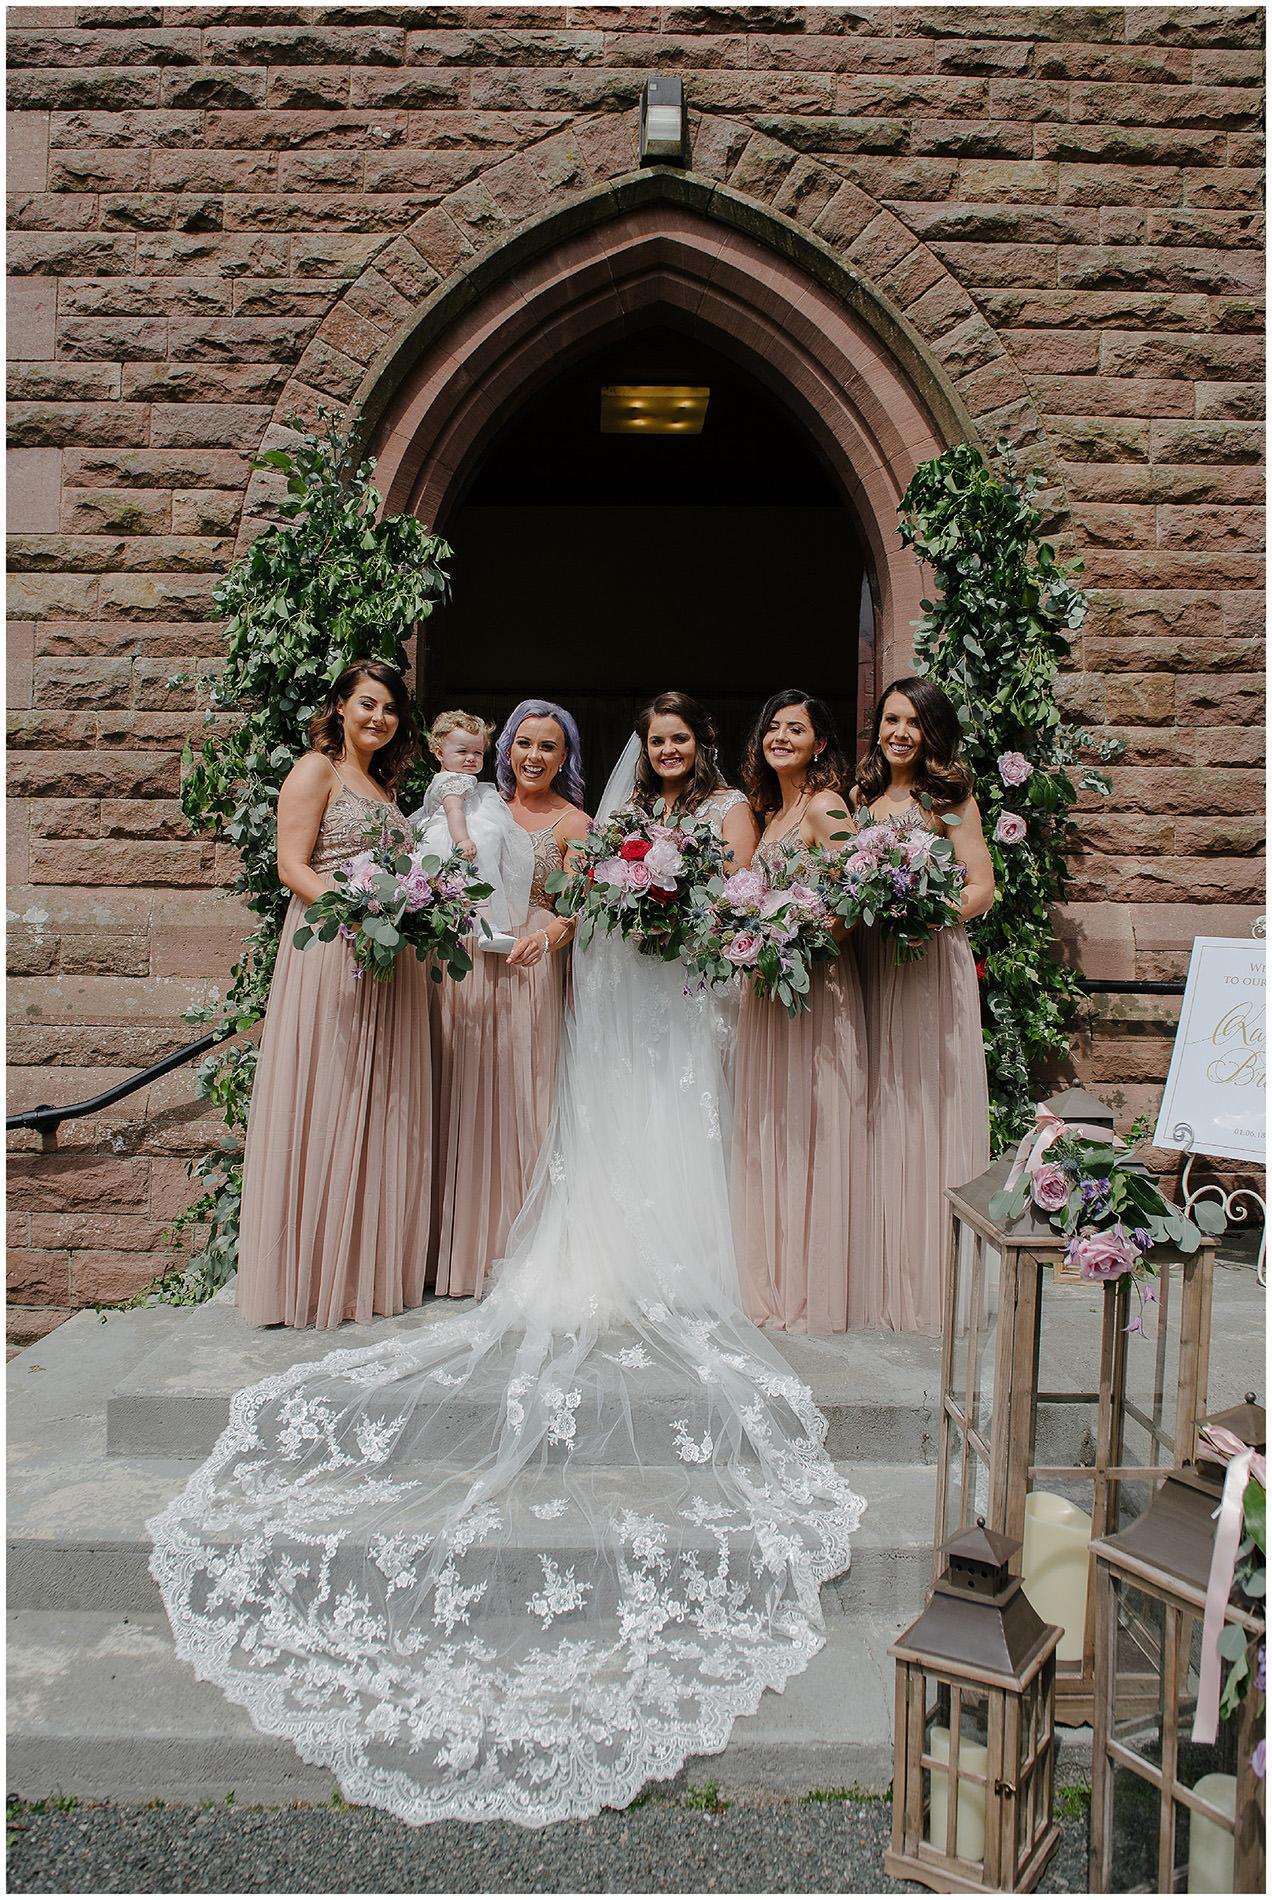 redcastle-hotel-wedding-karen-brian-jude-browne-photography-062.jpg